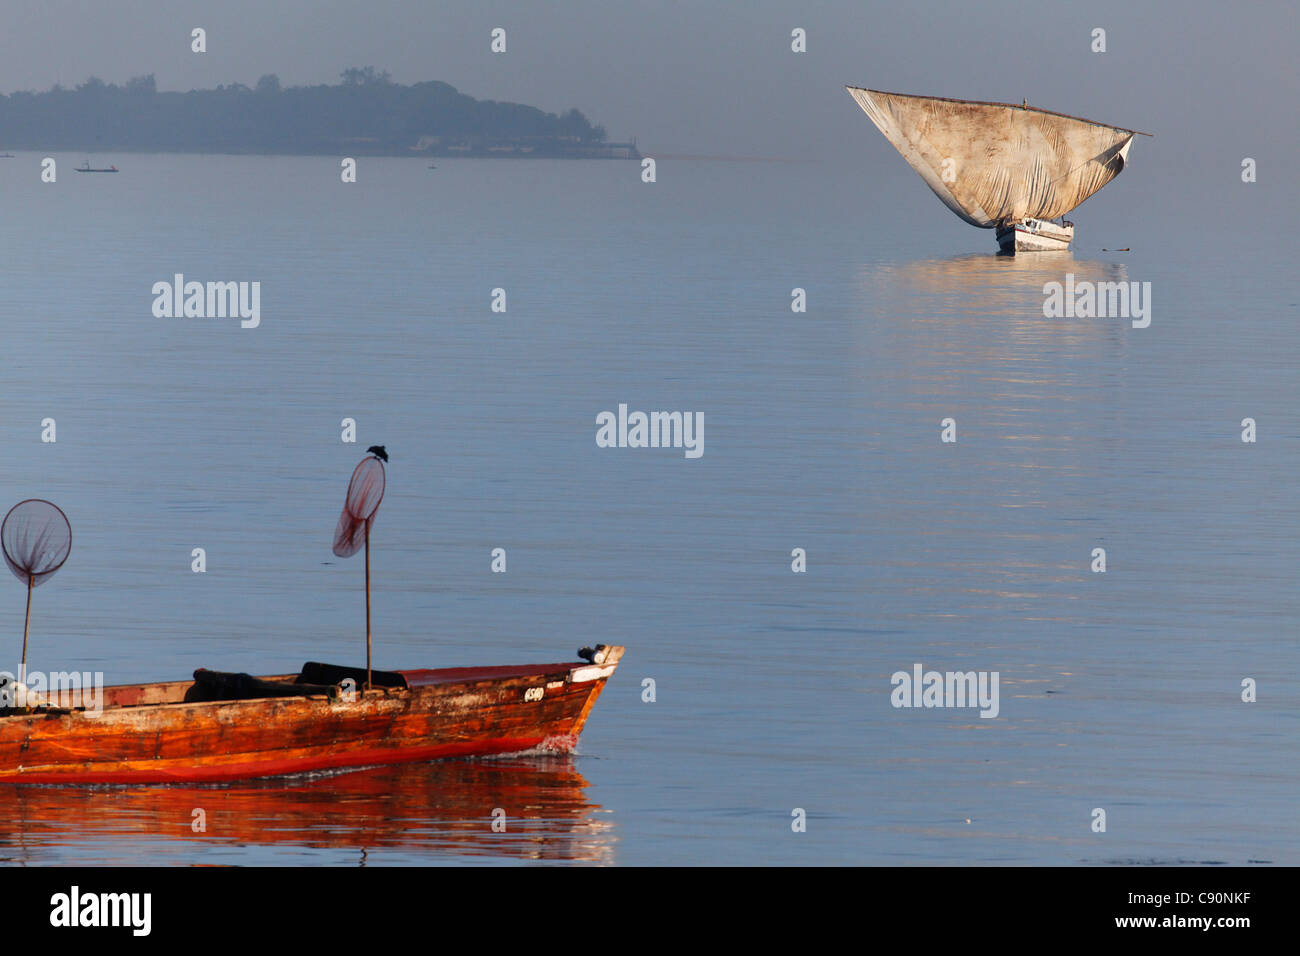 Dhow sailing near the shore, Stonetown, Zanzibar City, Zanzibar, Tanzania, Africa - Stock Image